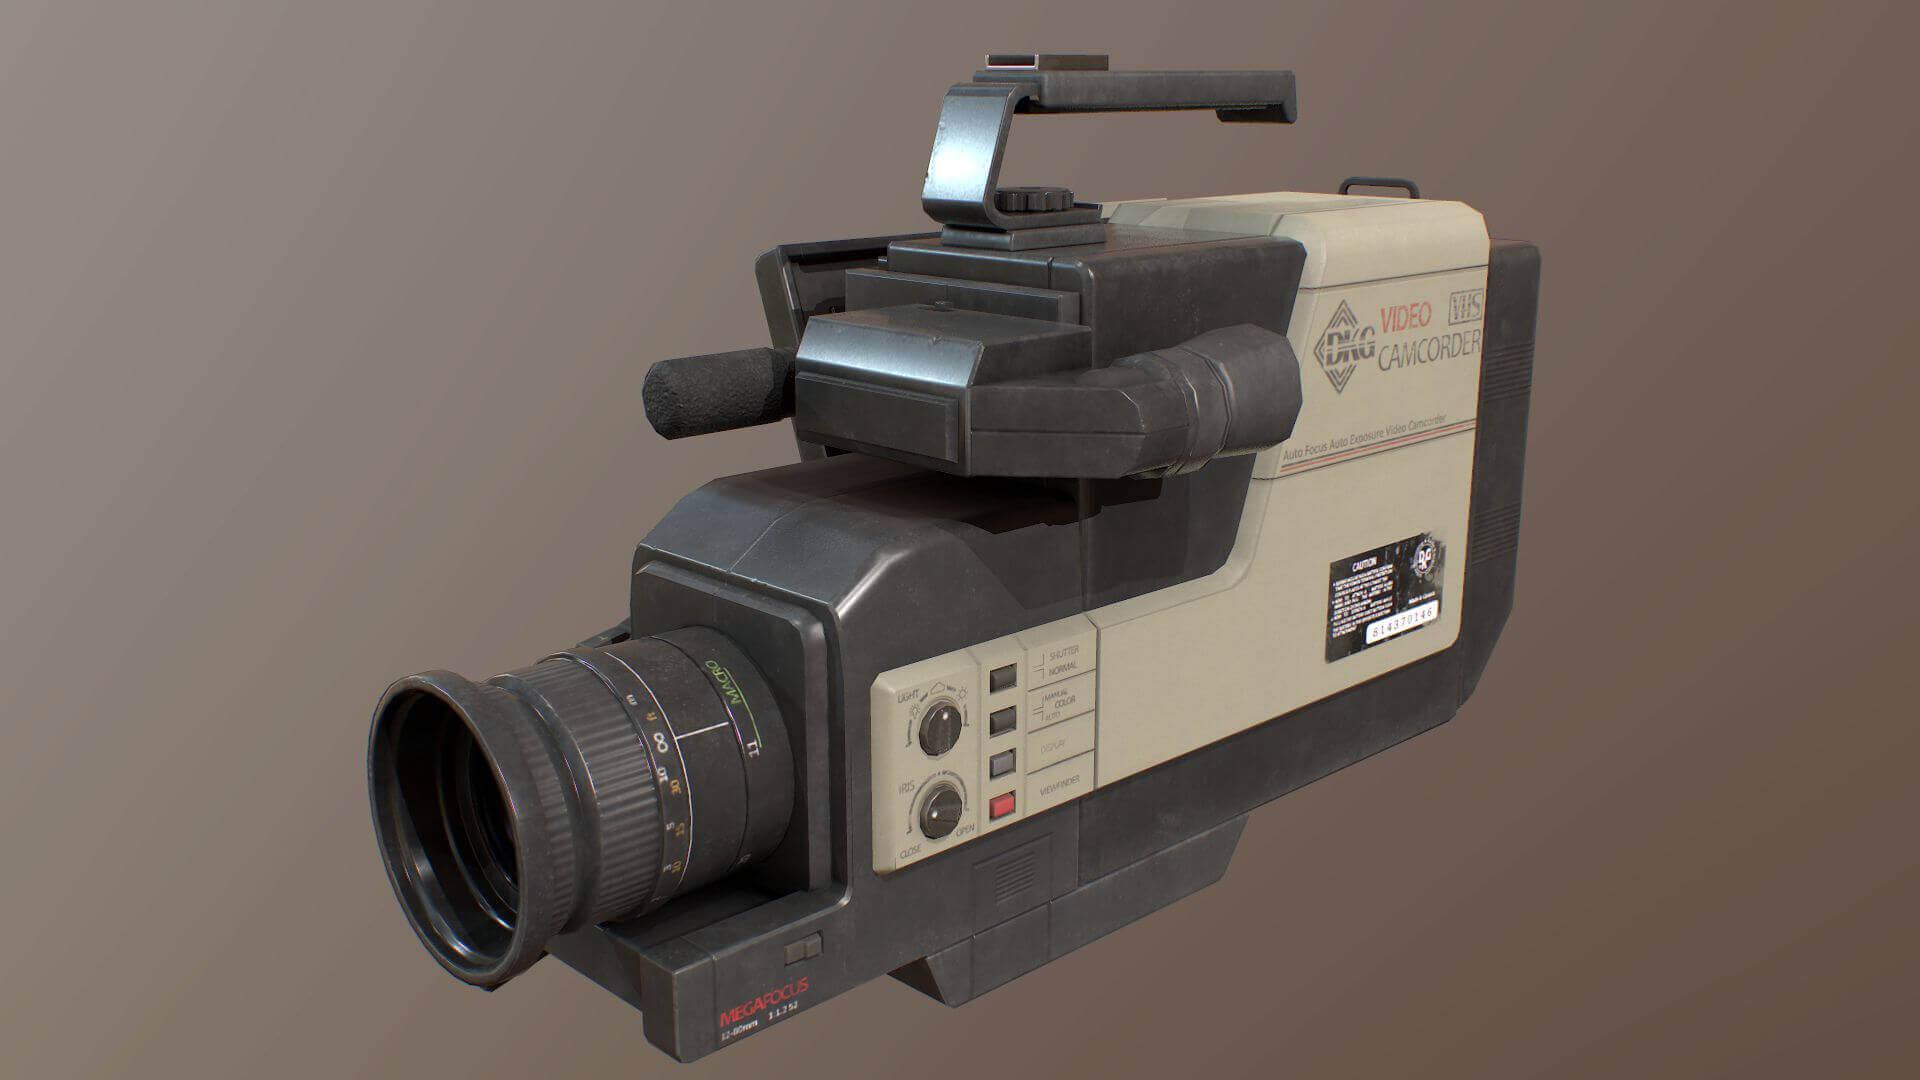 1980s Camcorder Video Recorder 3D Model